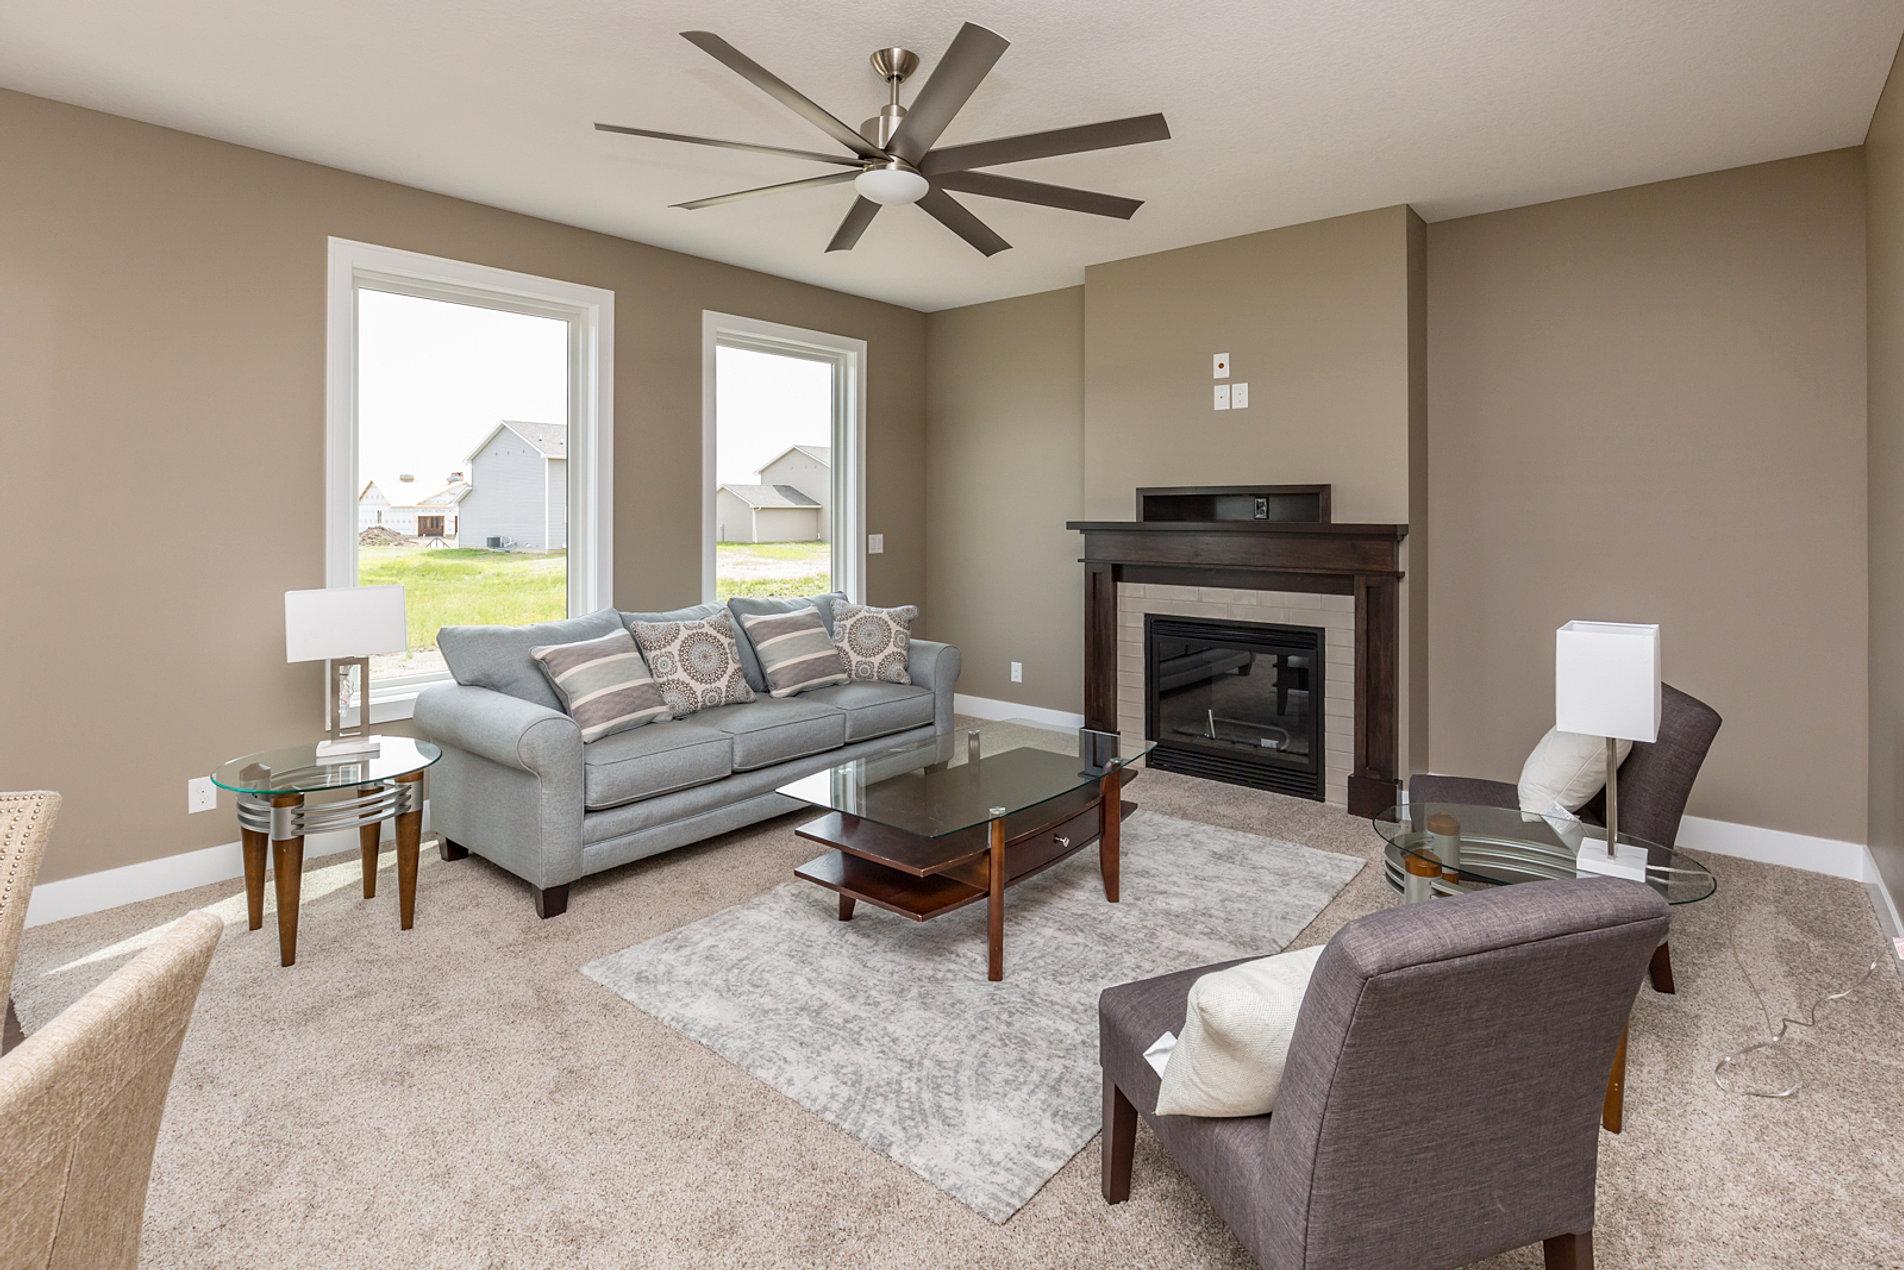 Homes For Sale Home Builder Hallbrooke Homes Inc Iowa